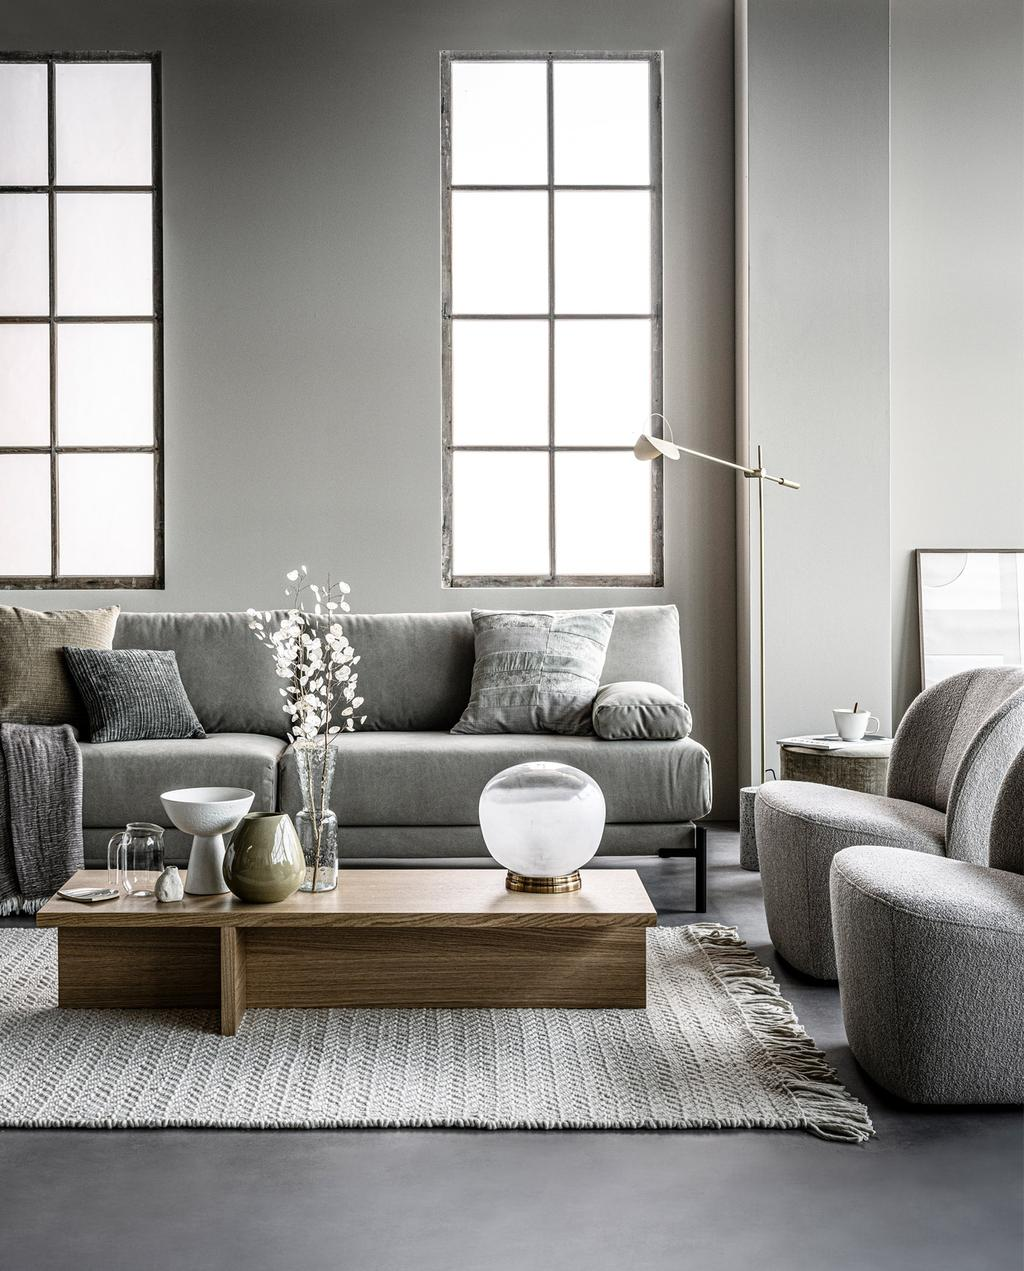 vtwonen | collectie | woonkamer